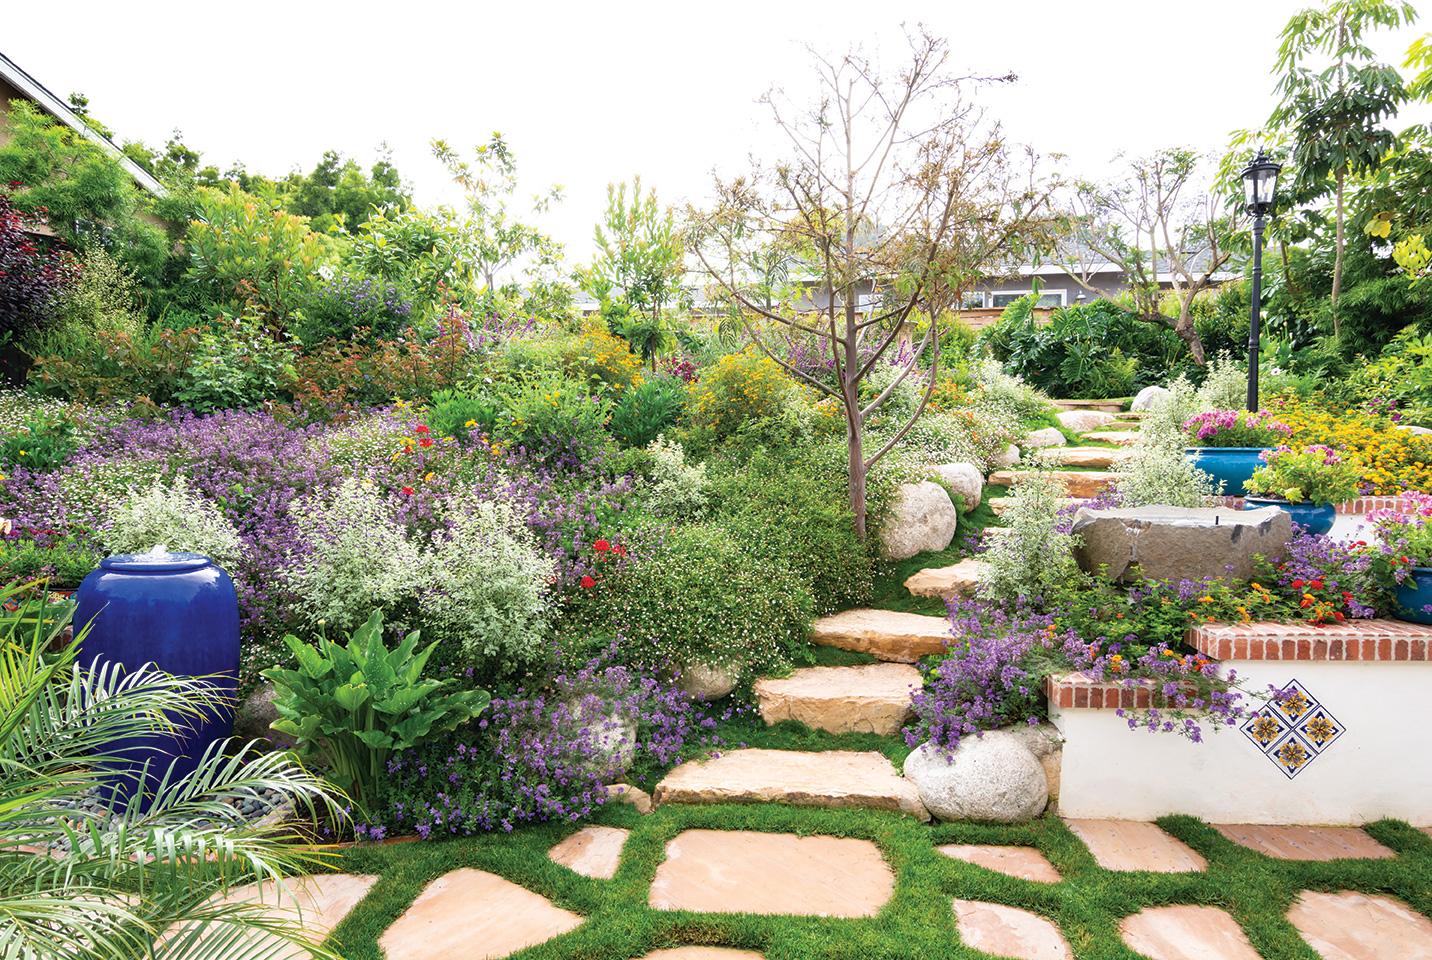 cottage garden terrace bubbler bird bath stairs